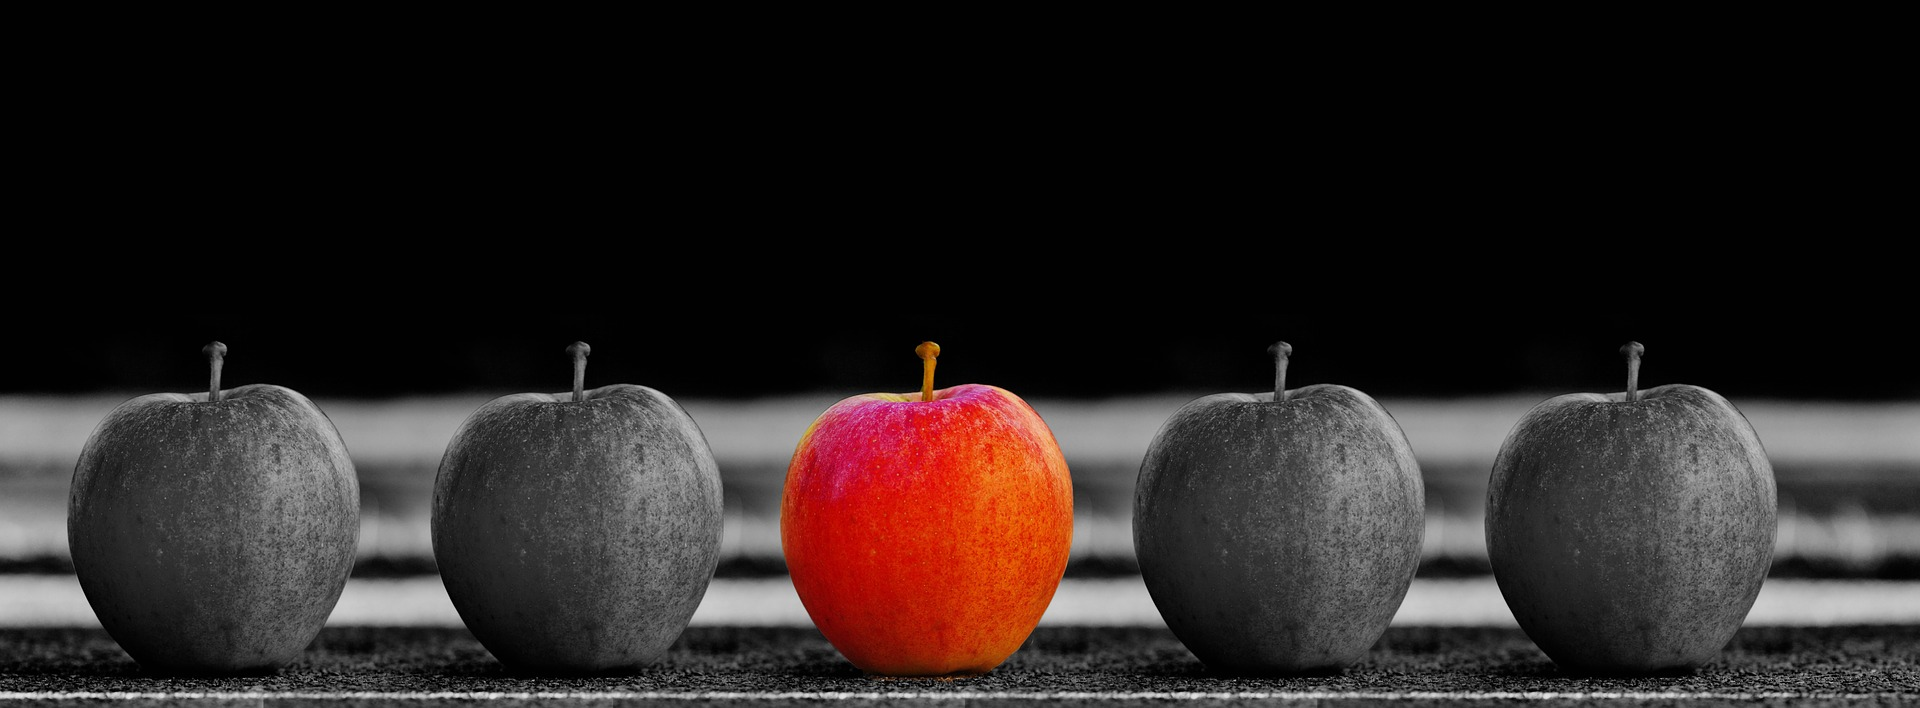 Apple 1594742 1920